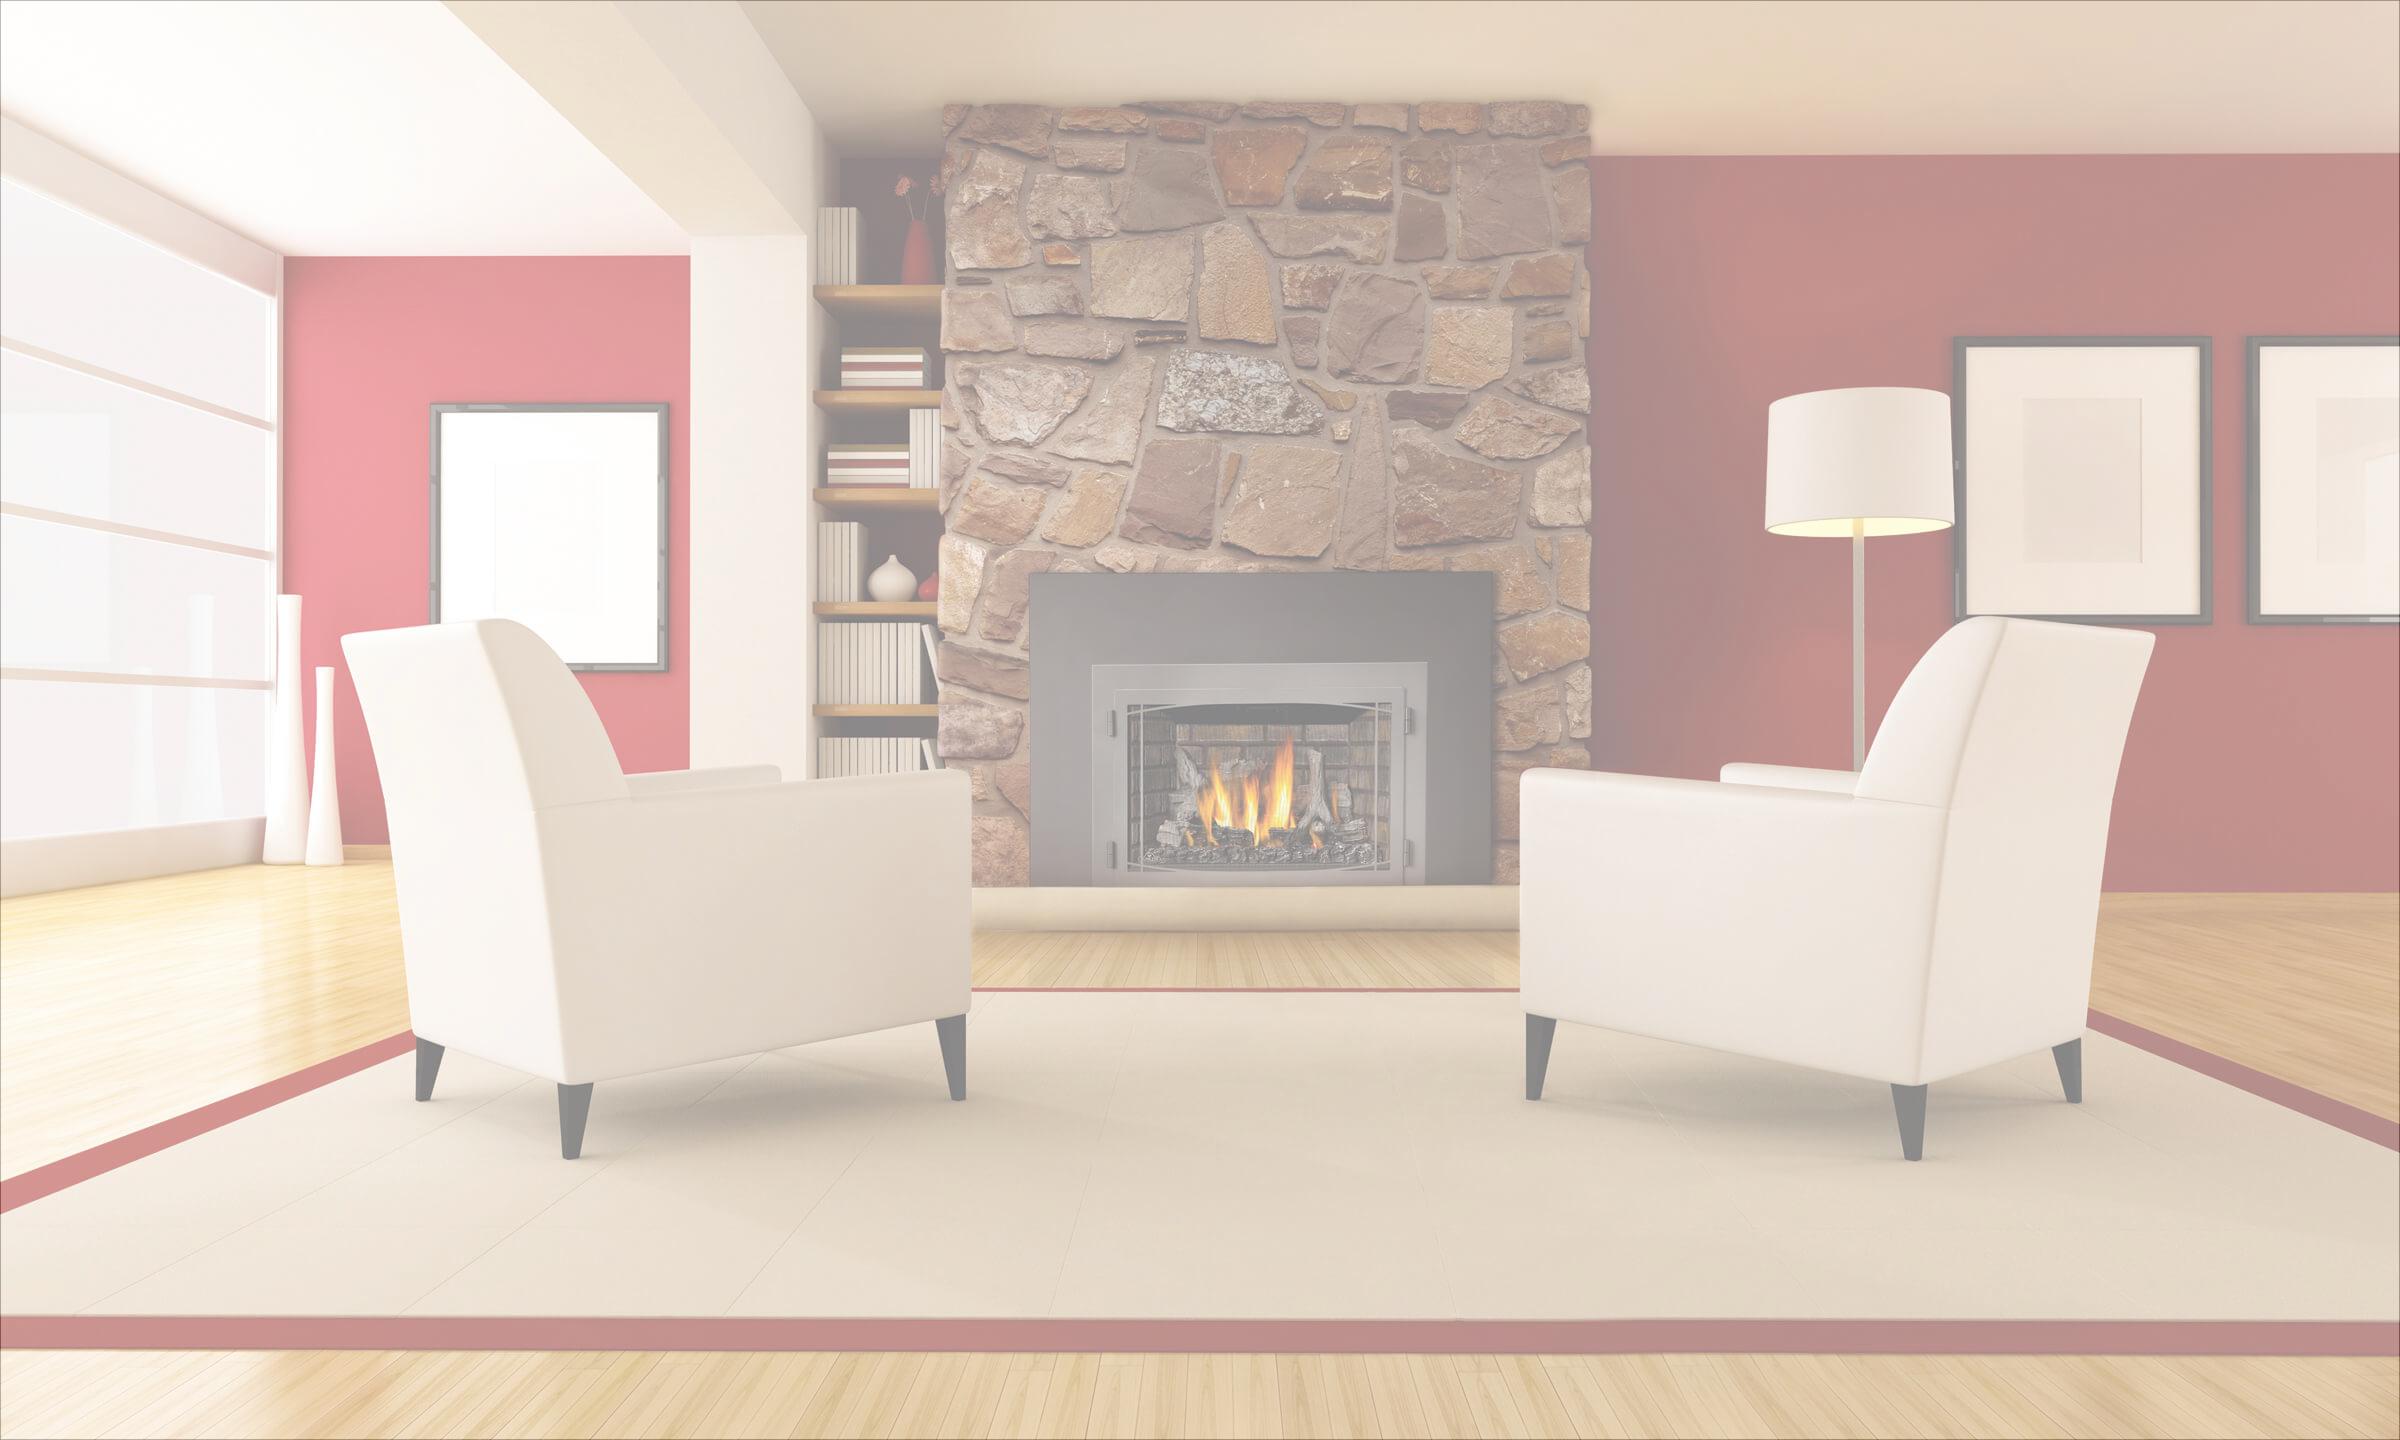 Pleasant Overridge Fireplace Port Perry Fireplace Furnace Barbeques Best Image Libraries Weasiibadanjobscom